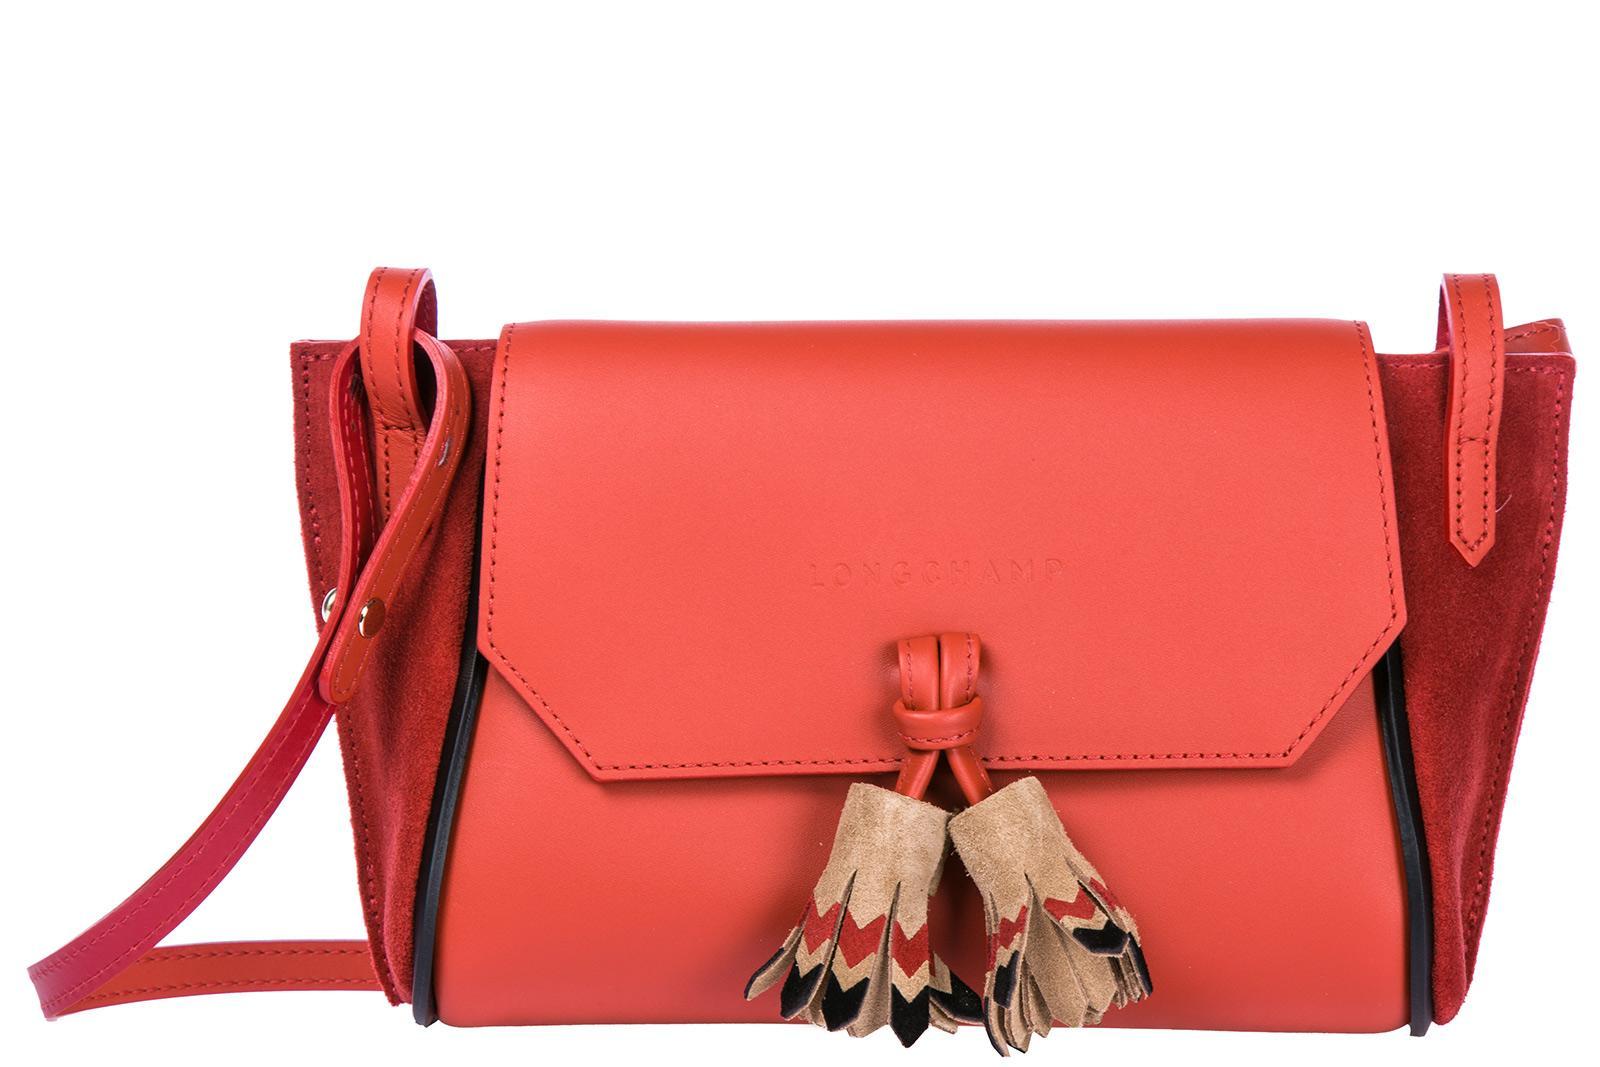 Longchamp UmhÄngetasche Damen Tasche Schultertasche Messenger Leder In Red